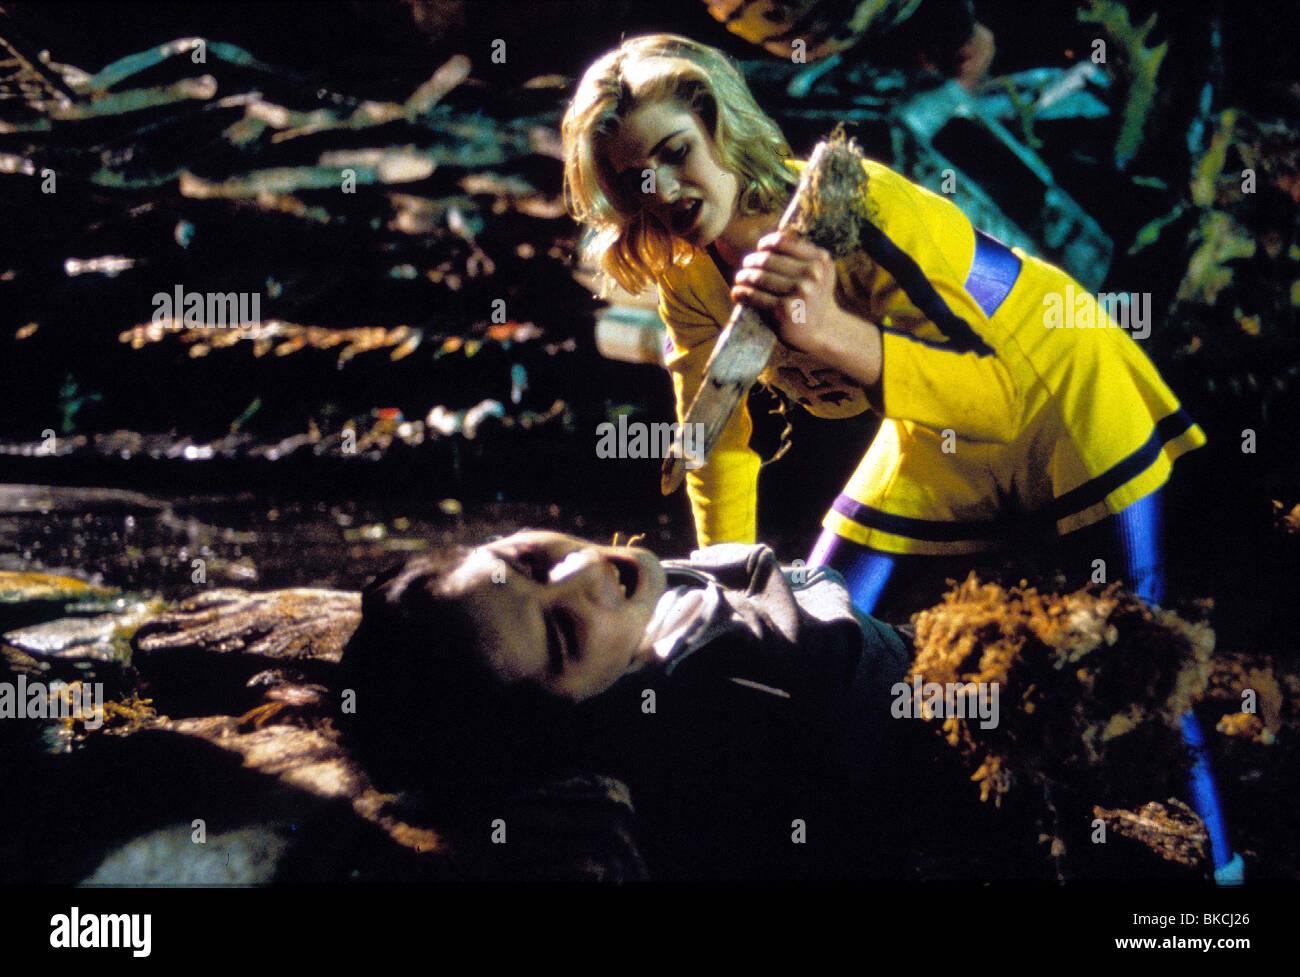 BUFFY THE VAMPIRE SLAYER (1992) KRISTY SWANSON BVS 061 - Stock Image